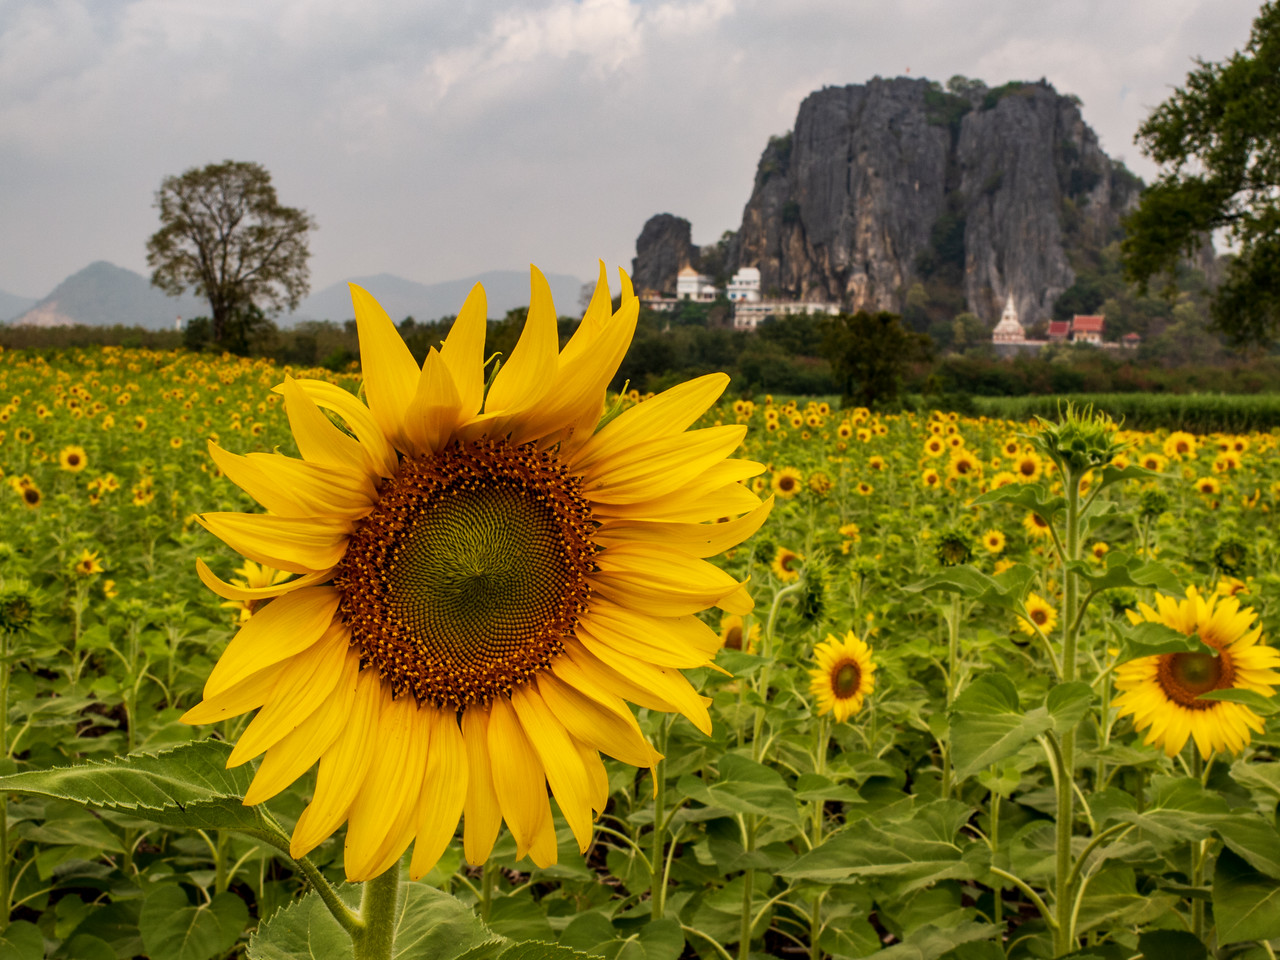 Sunflower Head in a Field Near Lopburi, Thailand